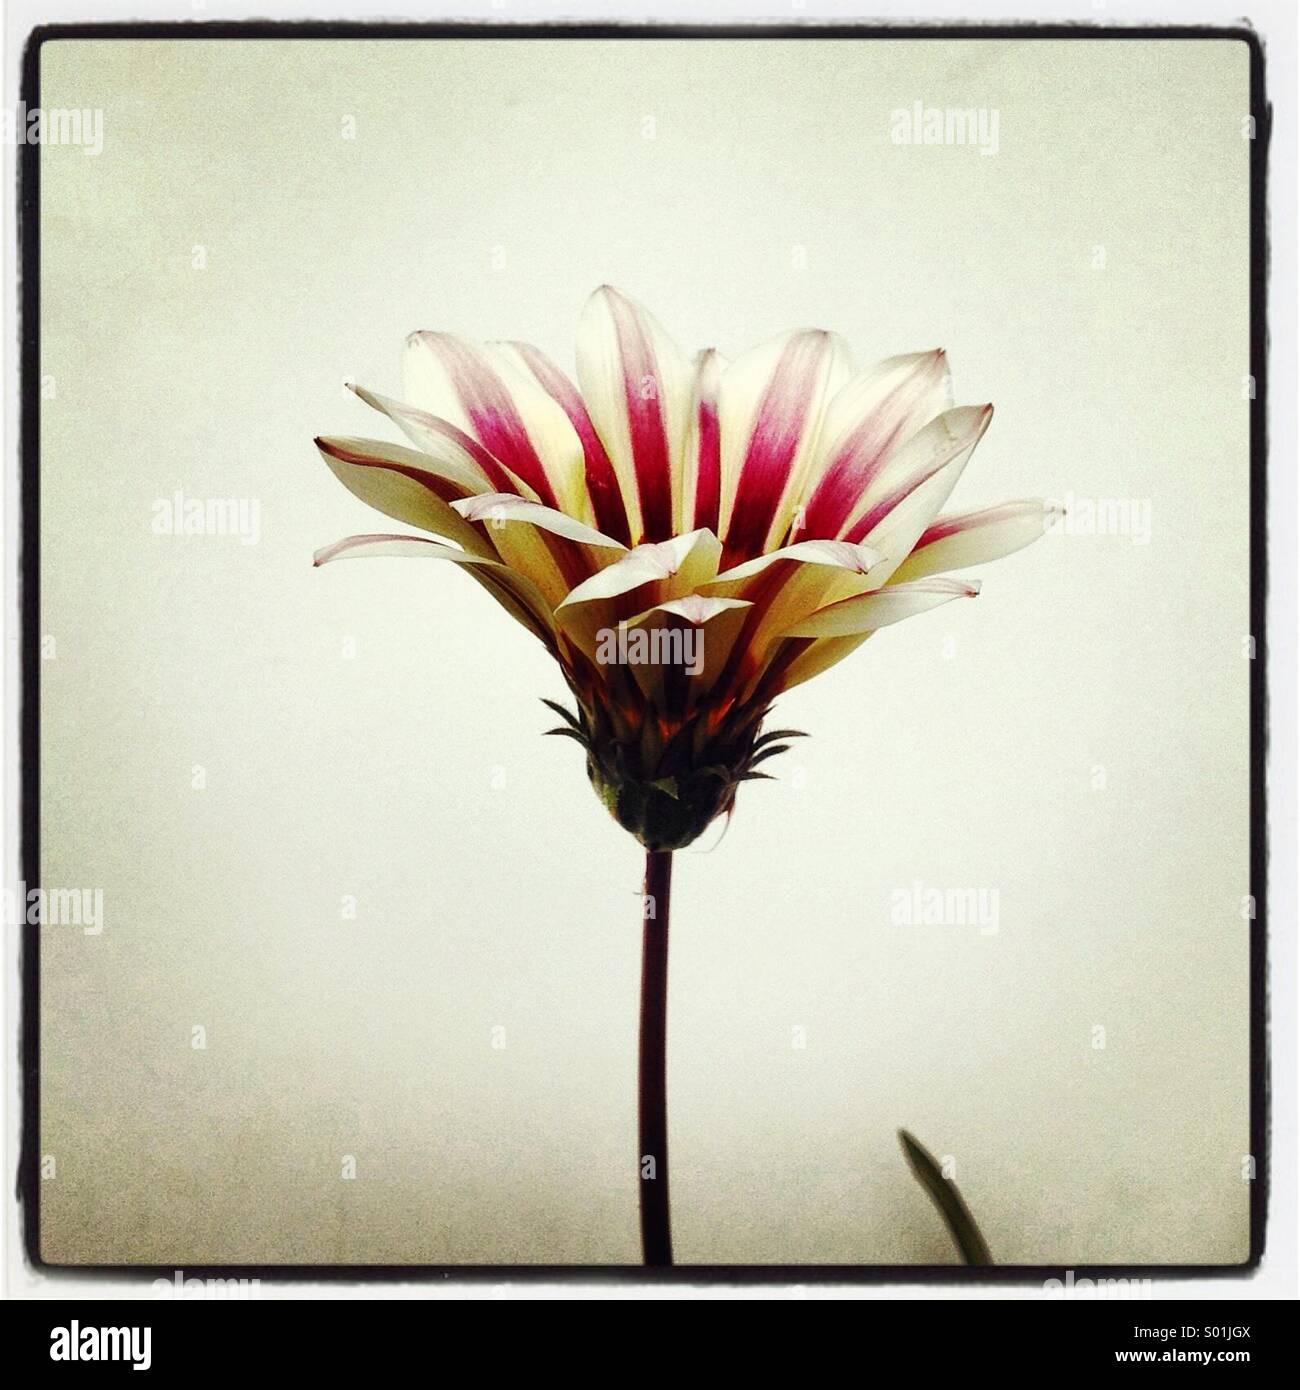 Single stripe dark pink and white dahlia  flower on white background - Stock Image